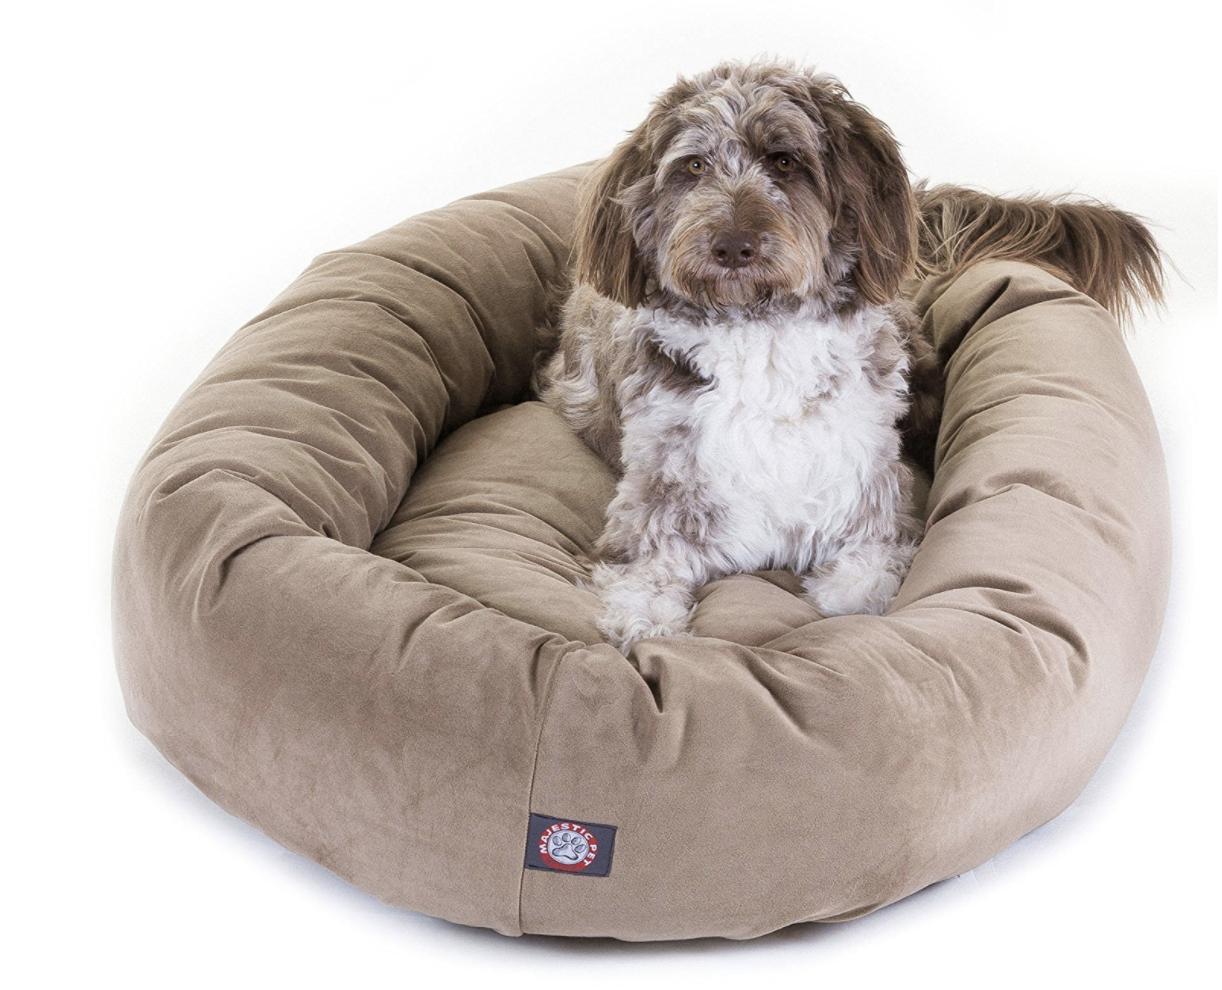 Majestic dog bed